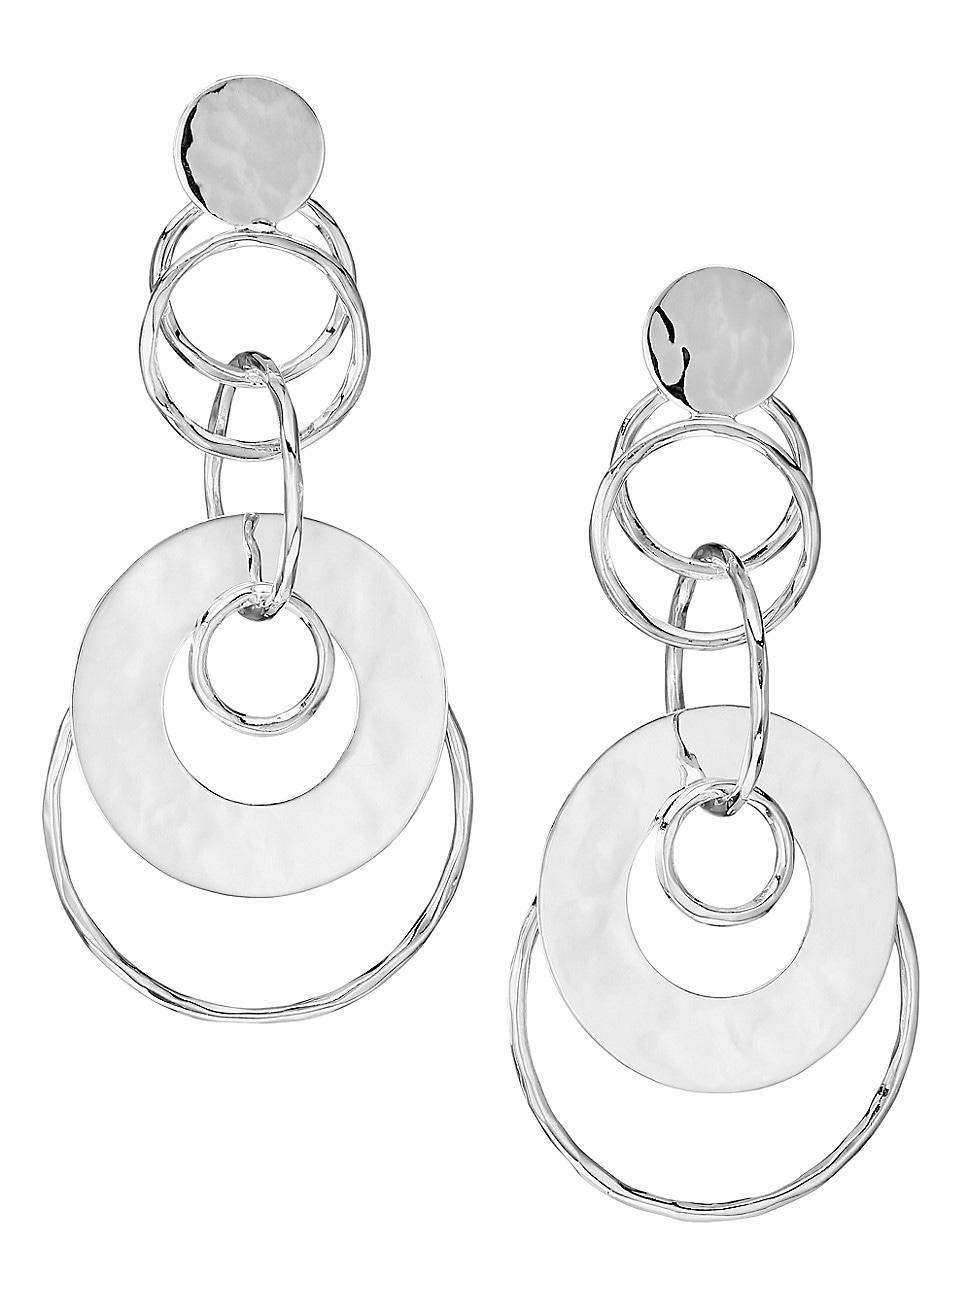 Ippolita Earrings WOMEN'S 925 CLASSICO CRINKLE STERLING SILVER MEDIUM DISC & LINKS JET SET EARRINGS